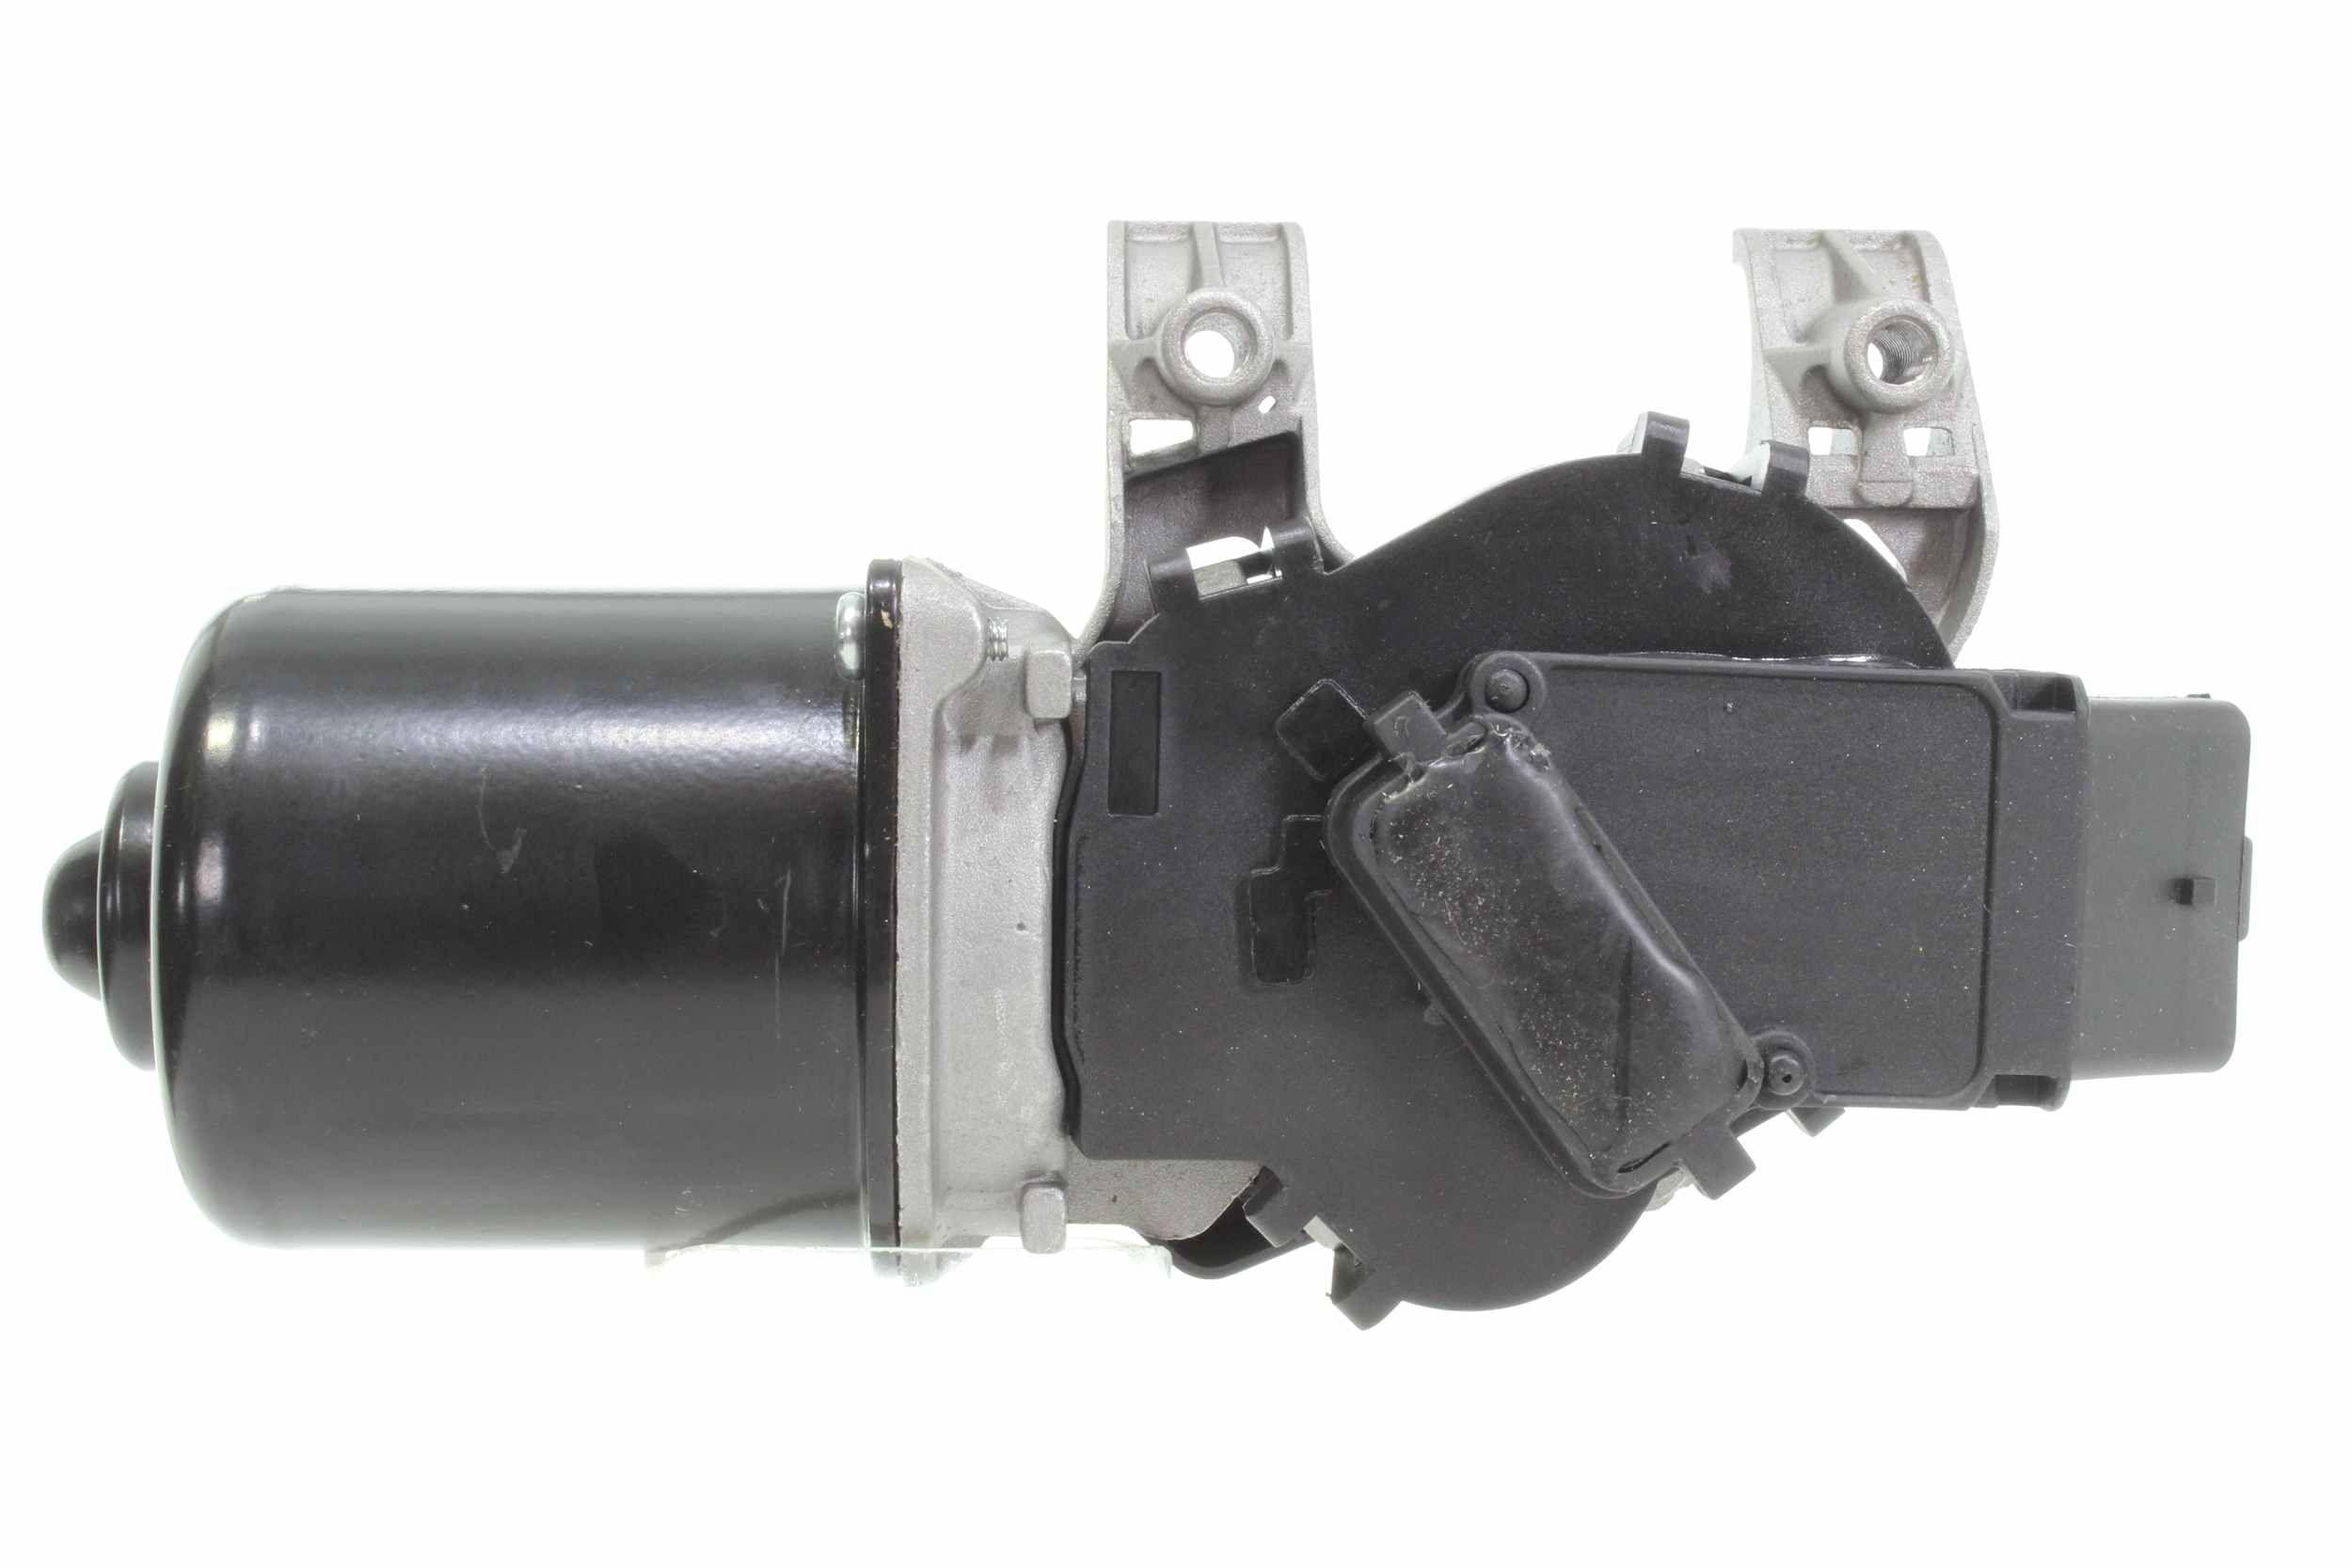 Window Wiper Motor ALANKO 10800159 expert knowledge